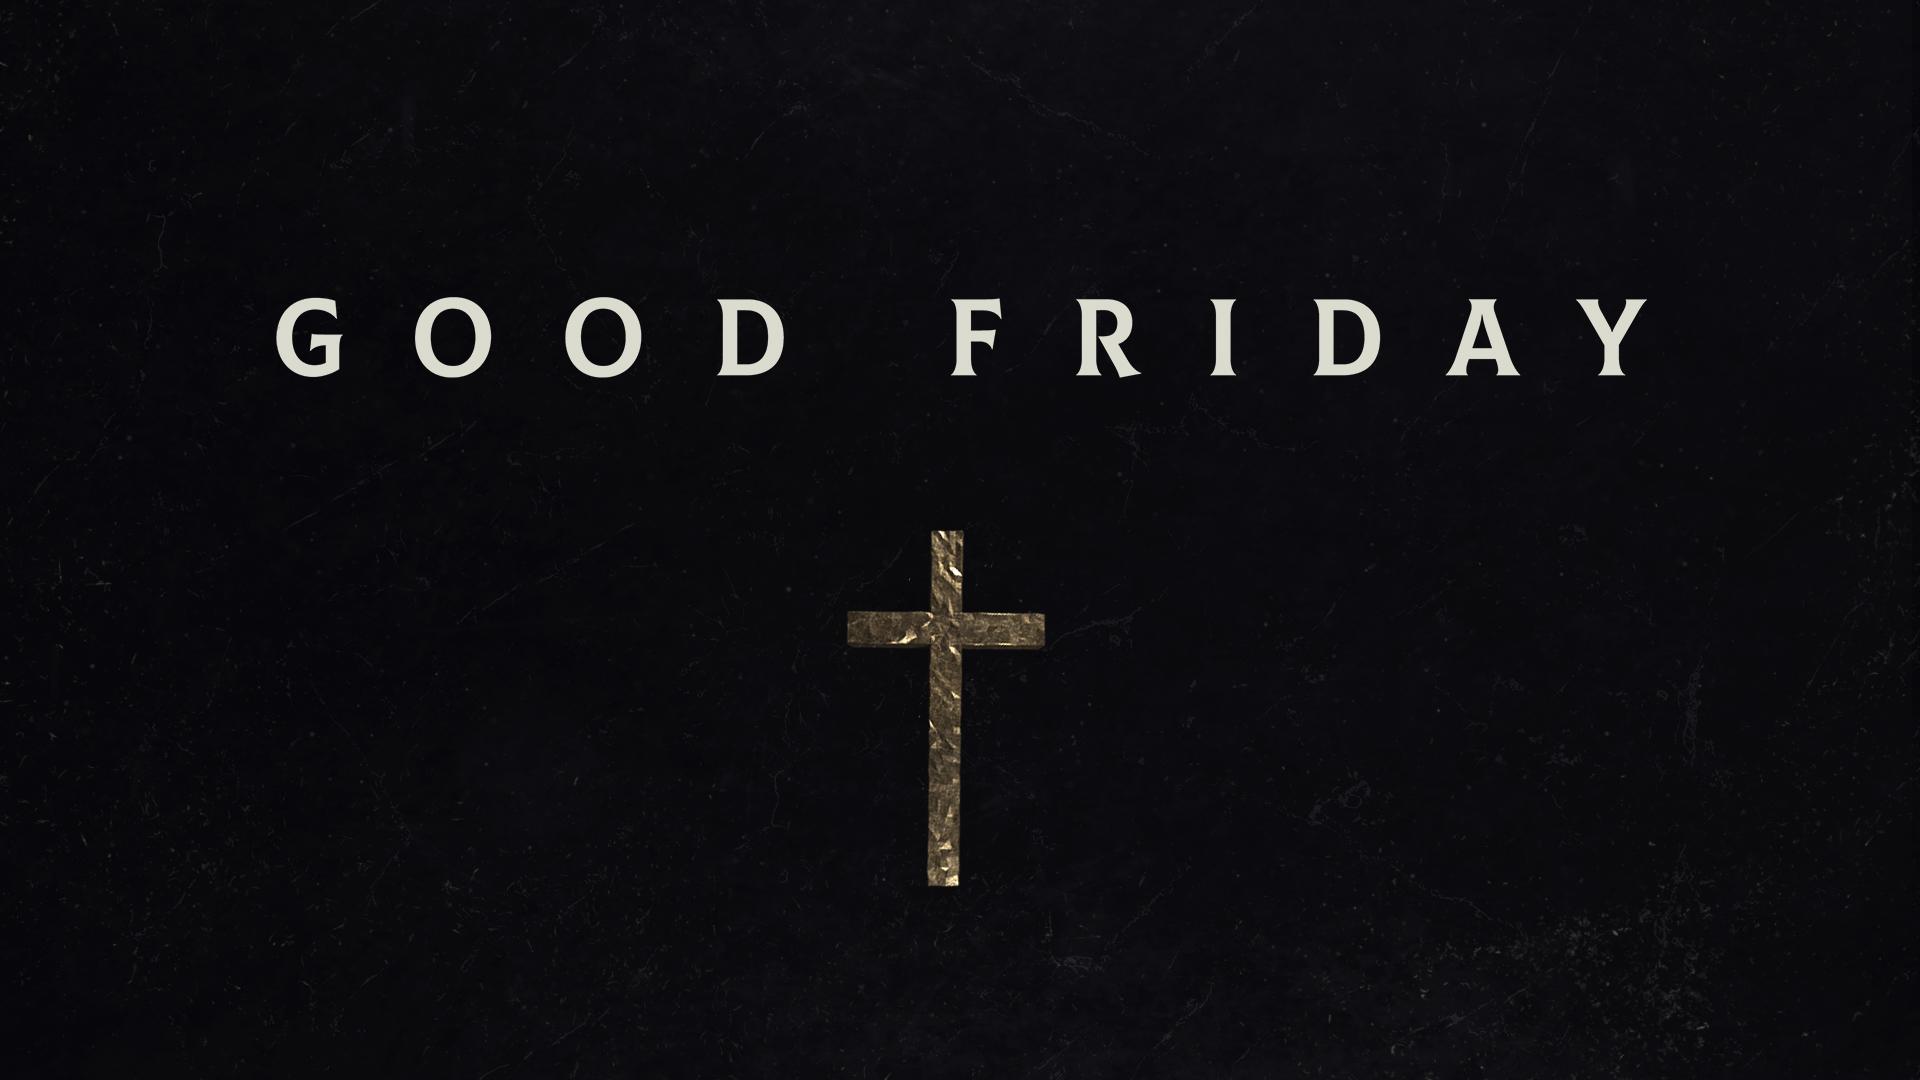 Good Friday.jpg